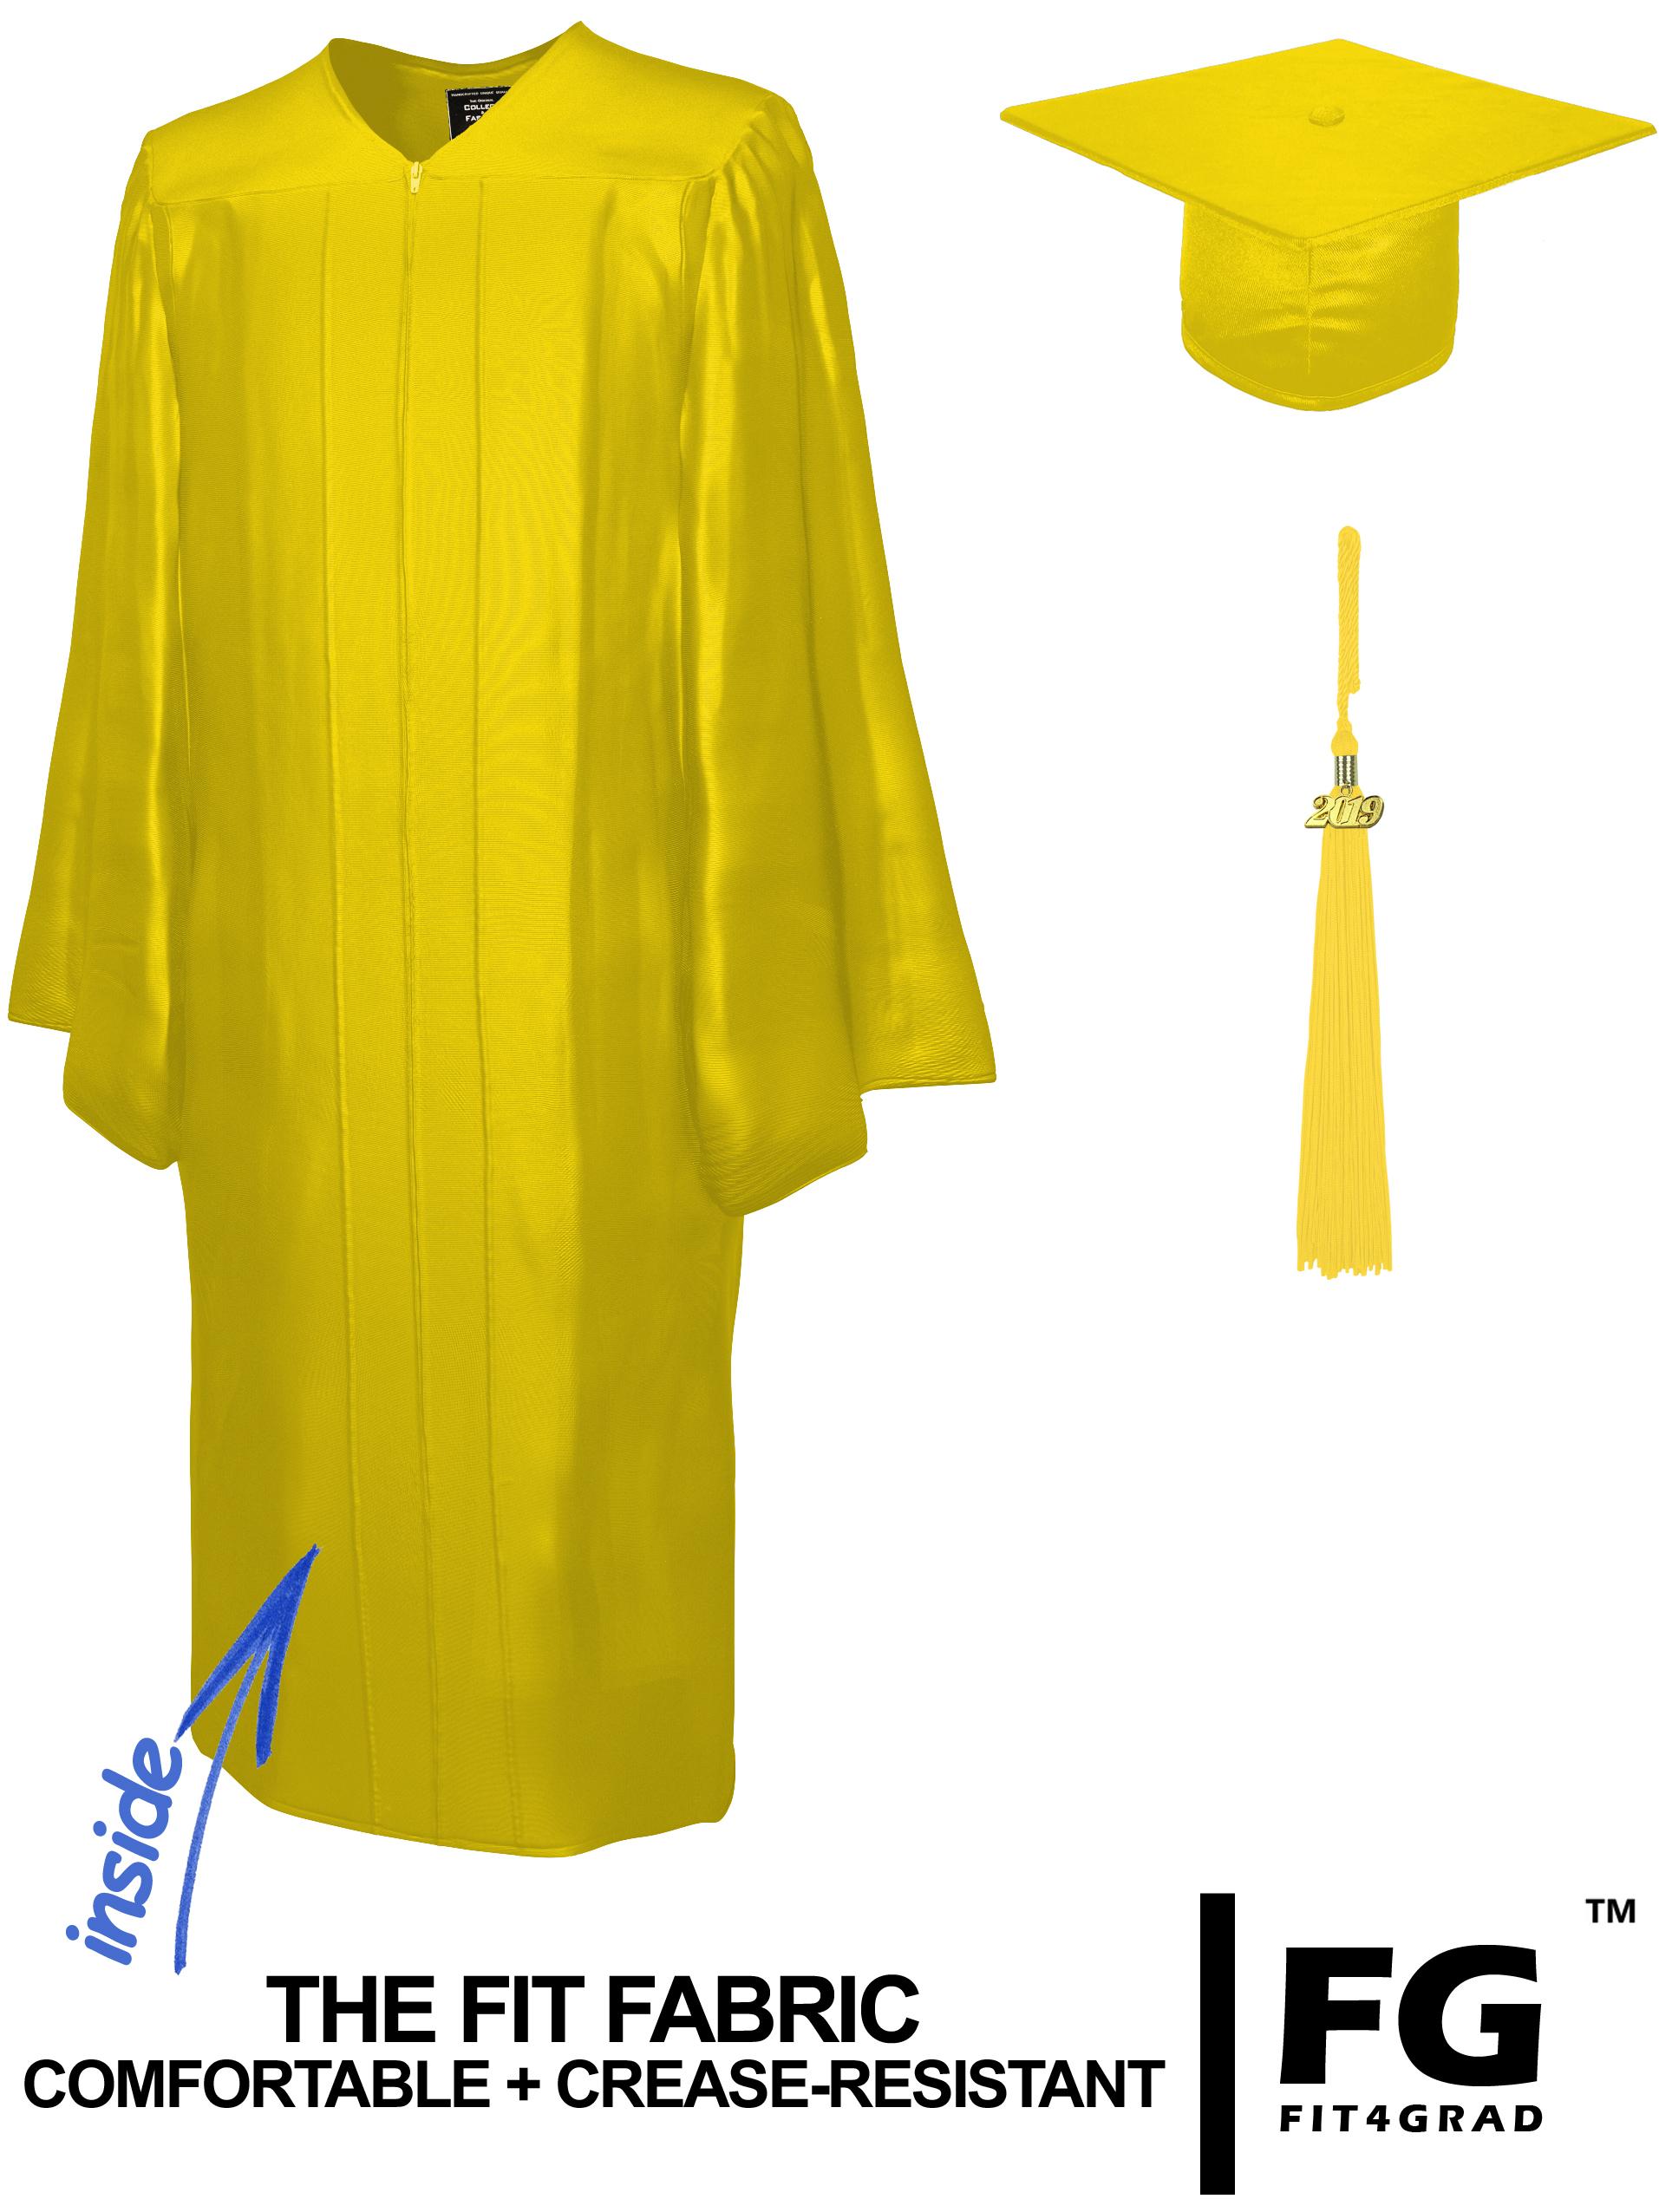 Doktorhut, Talar & Jahreszahlquaste, Qualität Shiny, gold-gelb